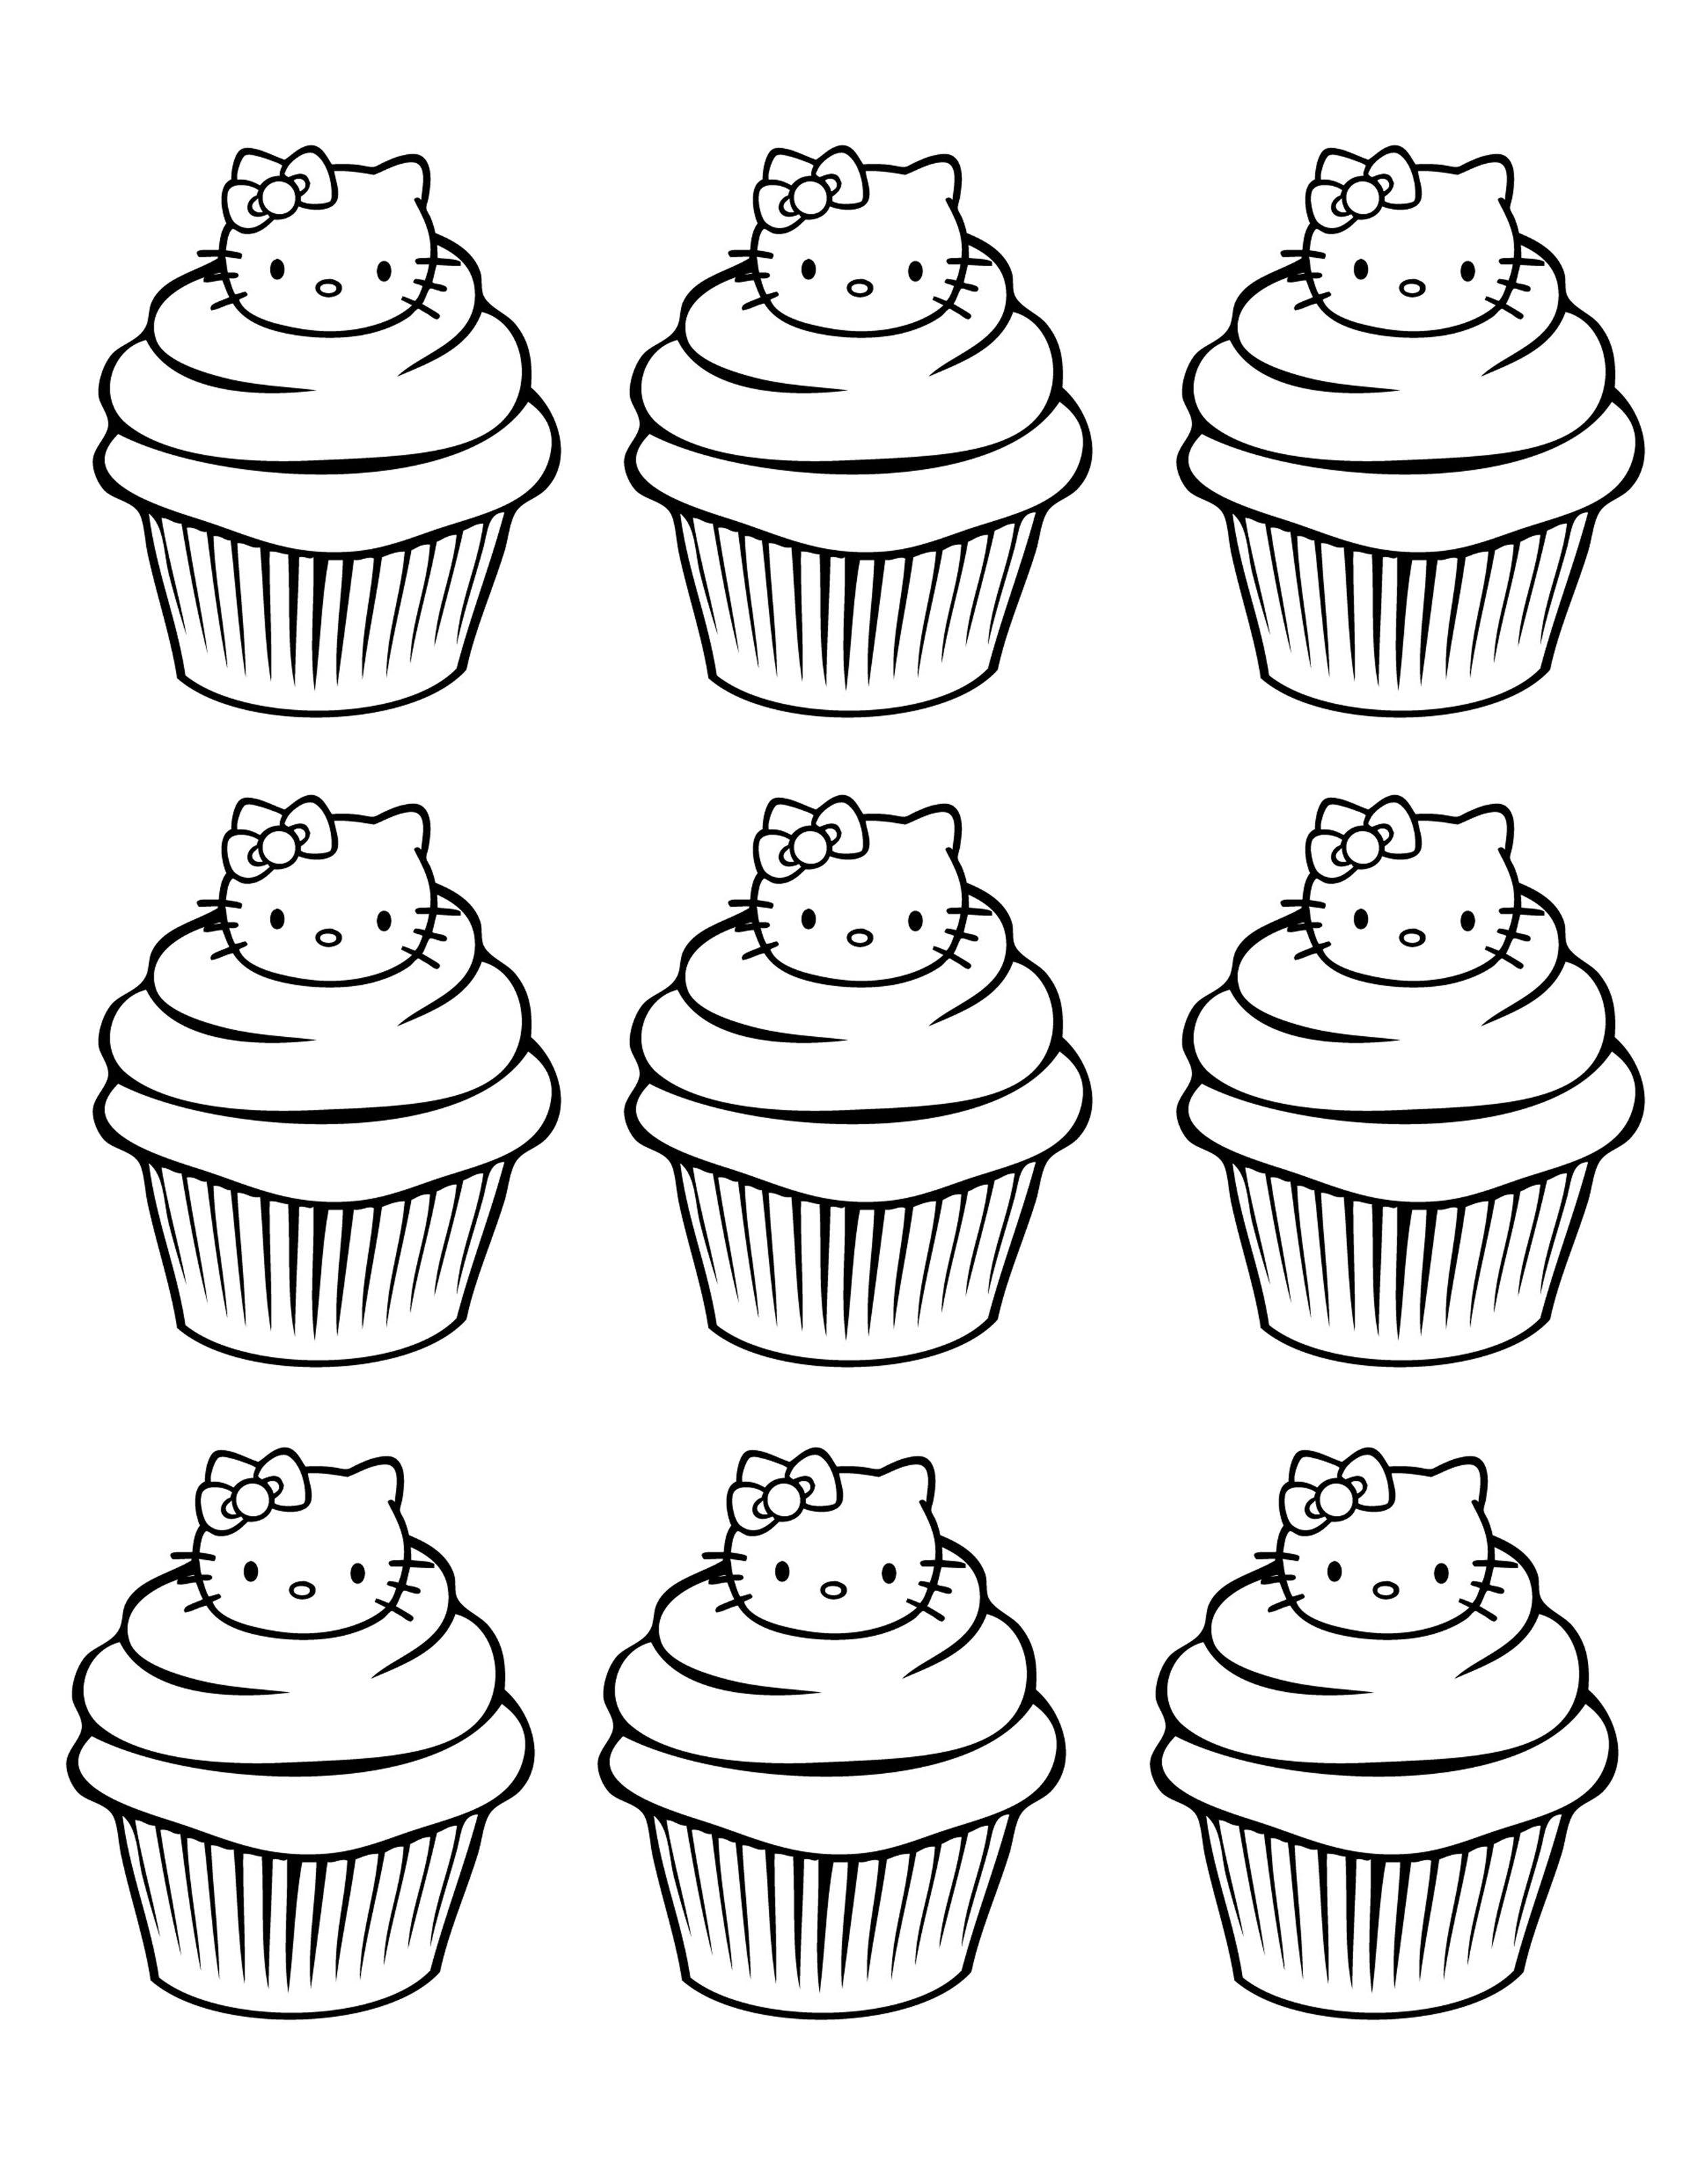 Galerie de coloriages gratuits coloriage-cupcakes-hello-kitty-simple ...